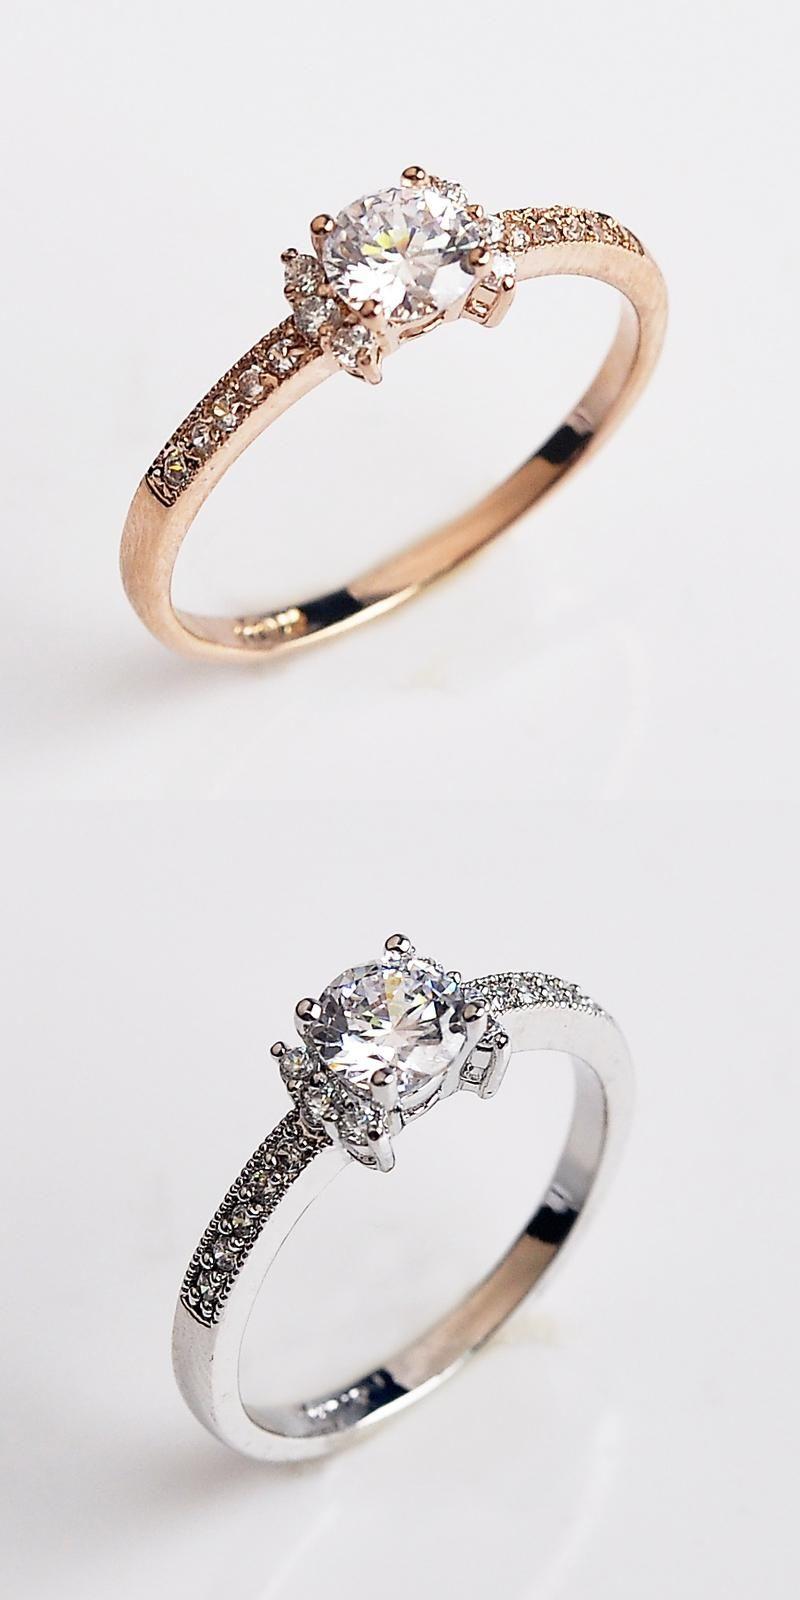 [Visit To Buy] USTAR Zircon Jewelry Wedding Rings For Women Fine Jewelry  Austria Crystal